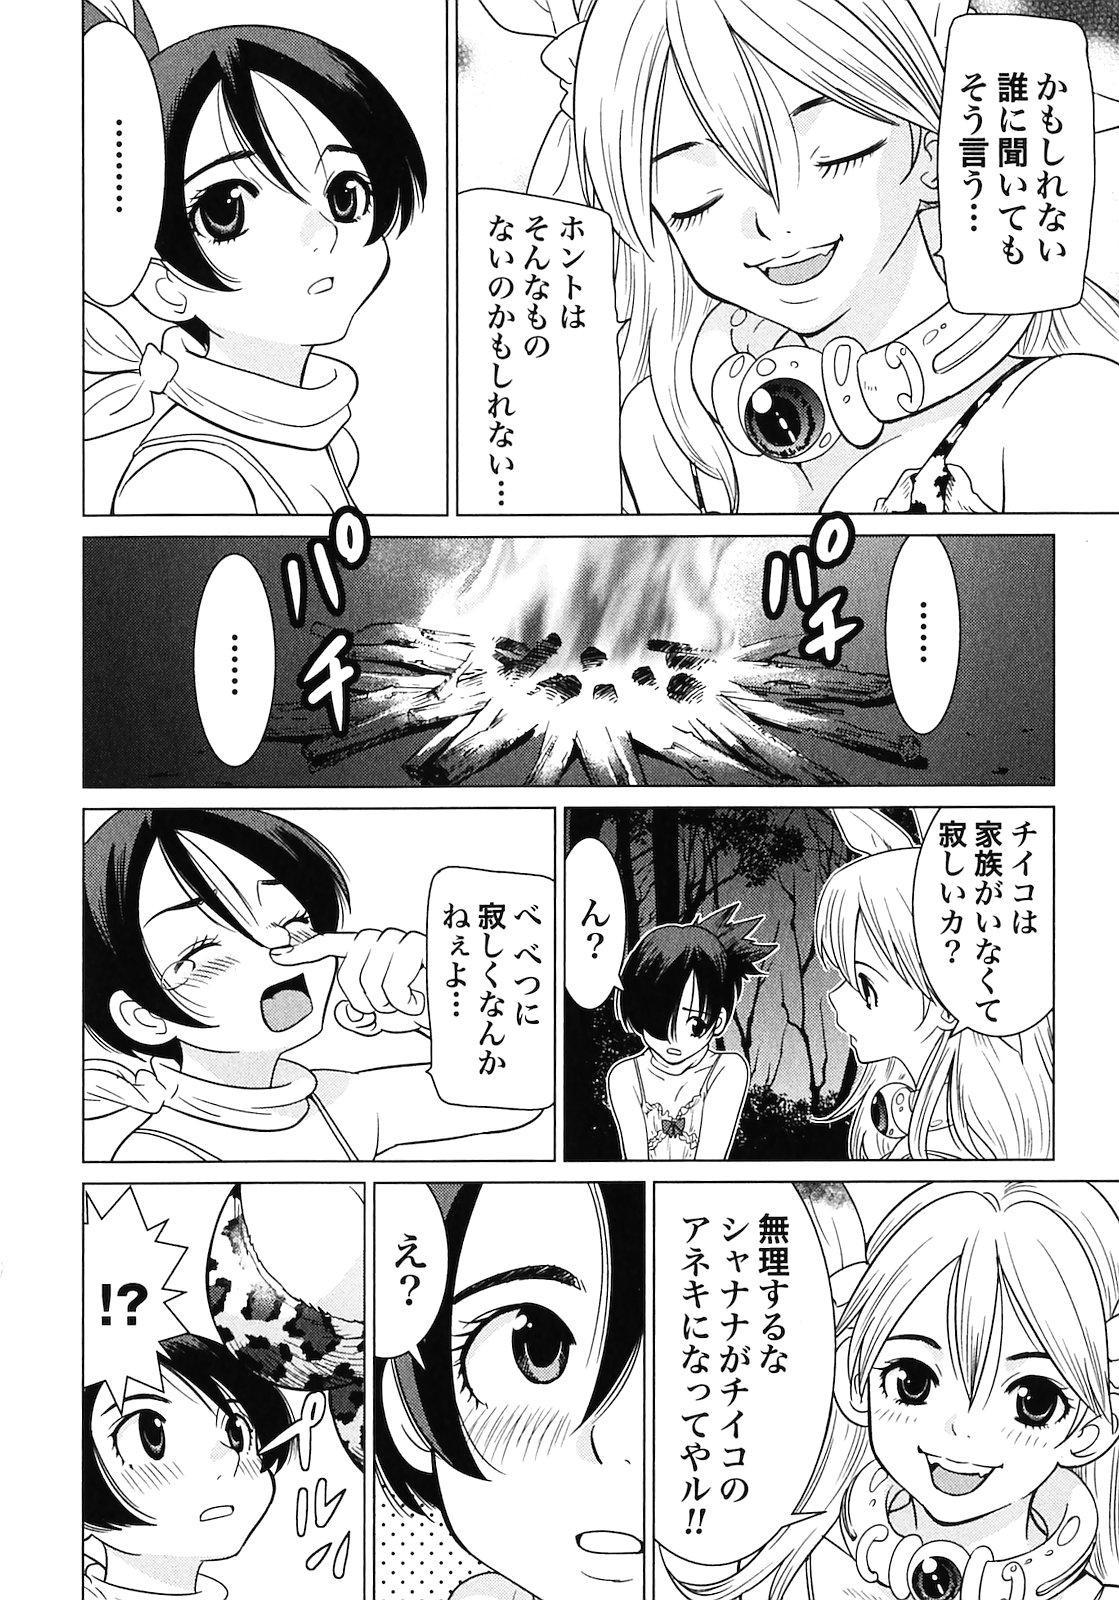 Makyo no Shanana Vol.02 19